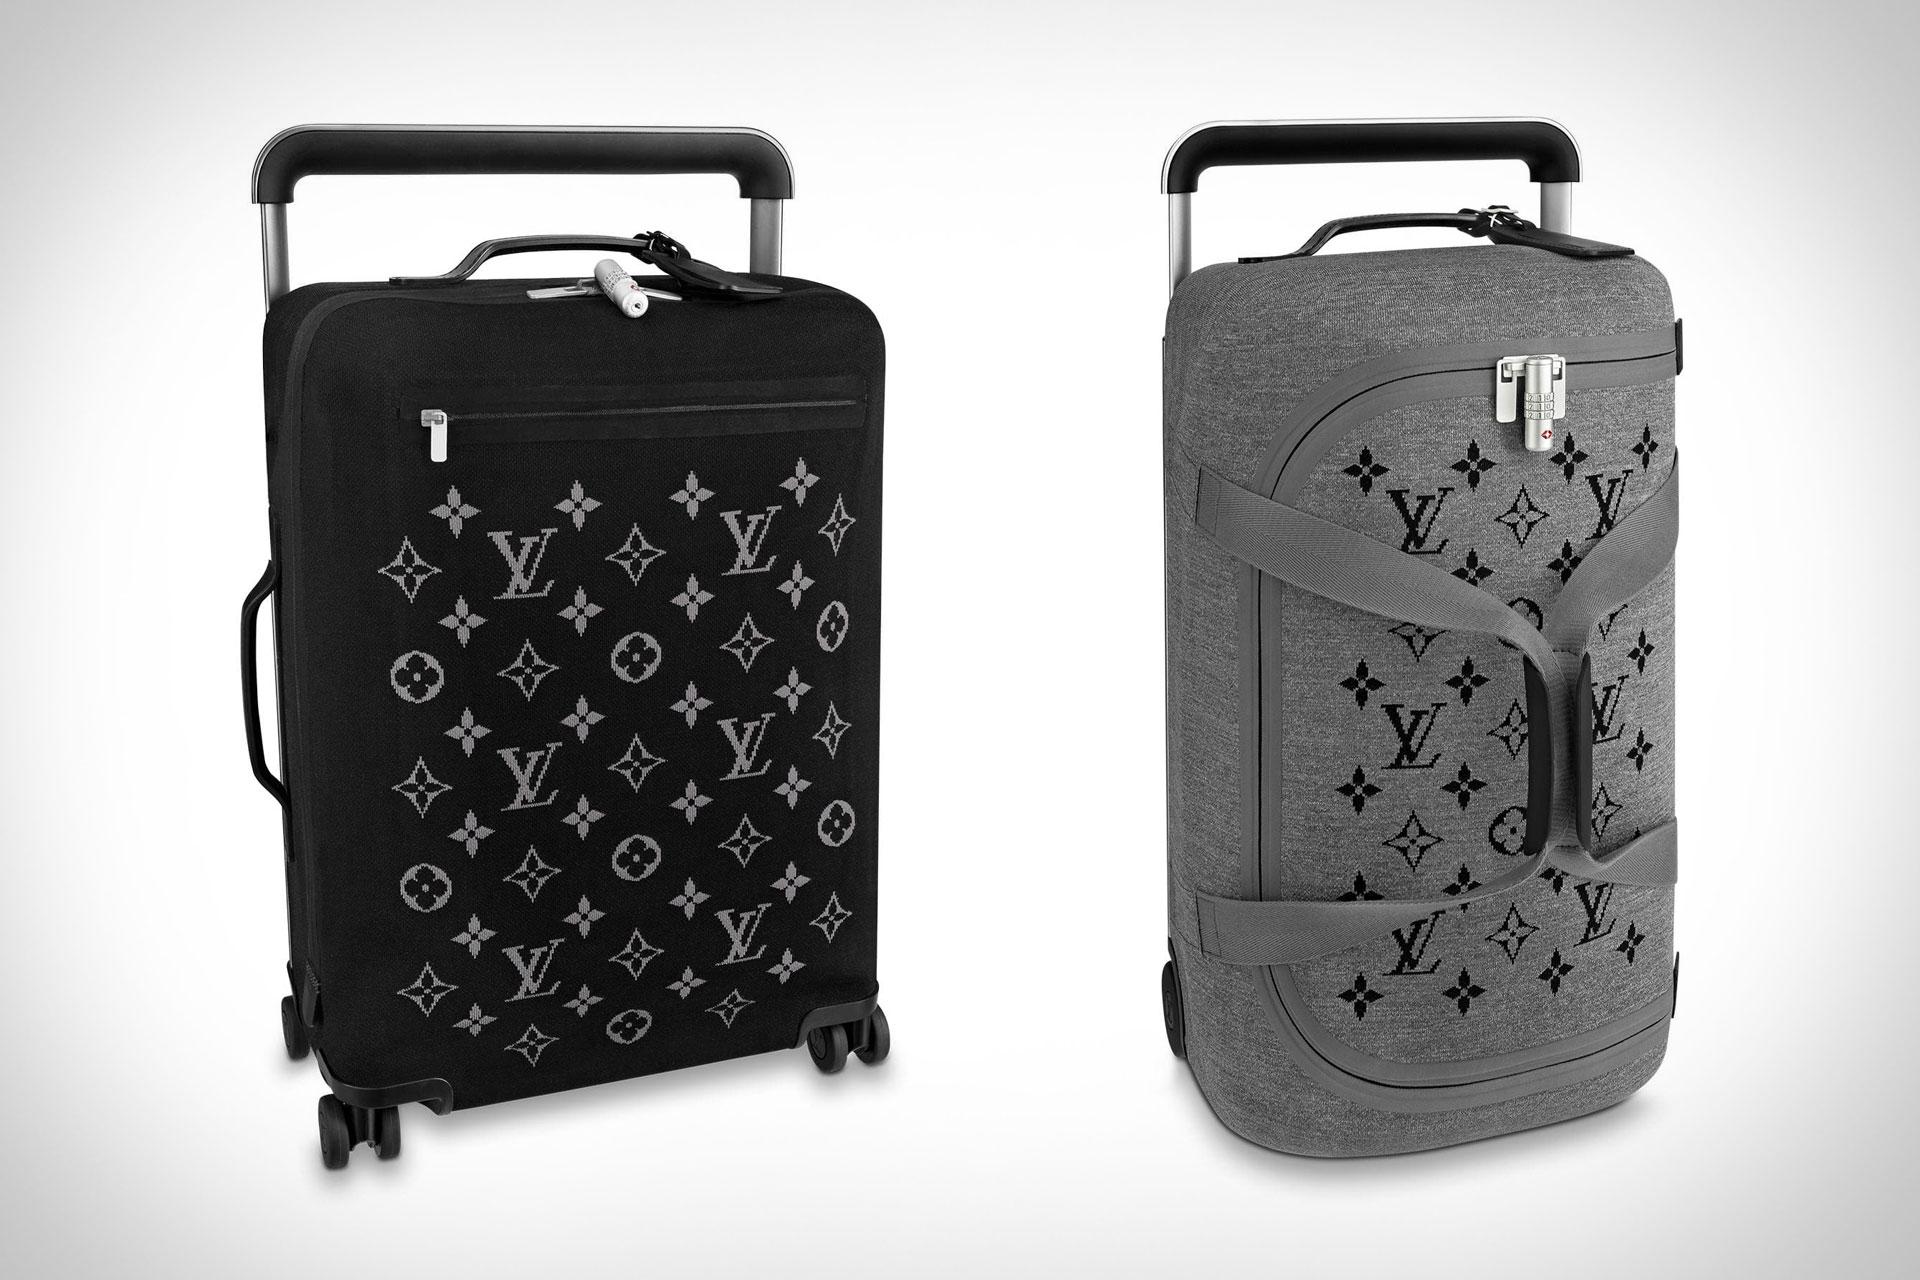 Louis Vuitton Horizon Soft Luggage Collection